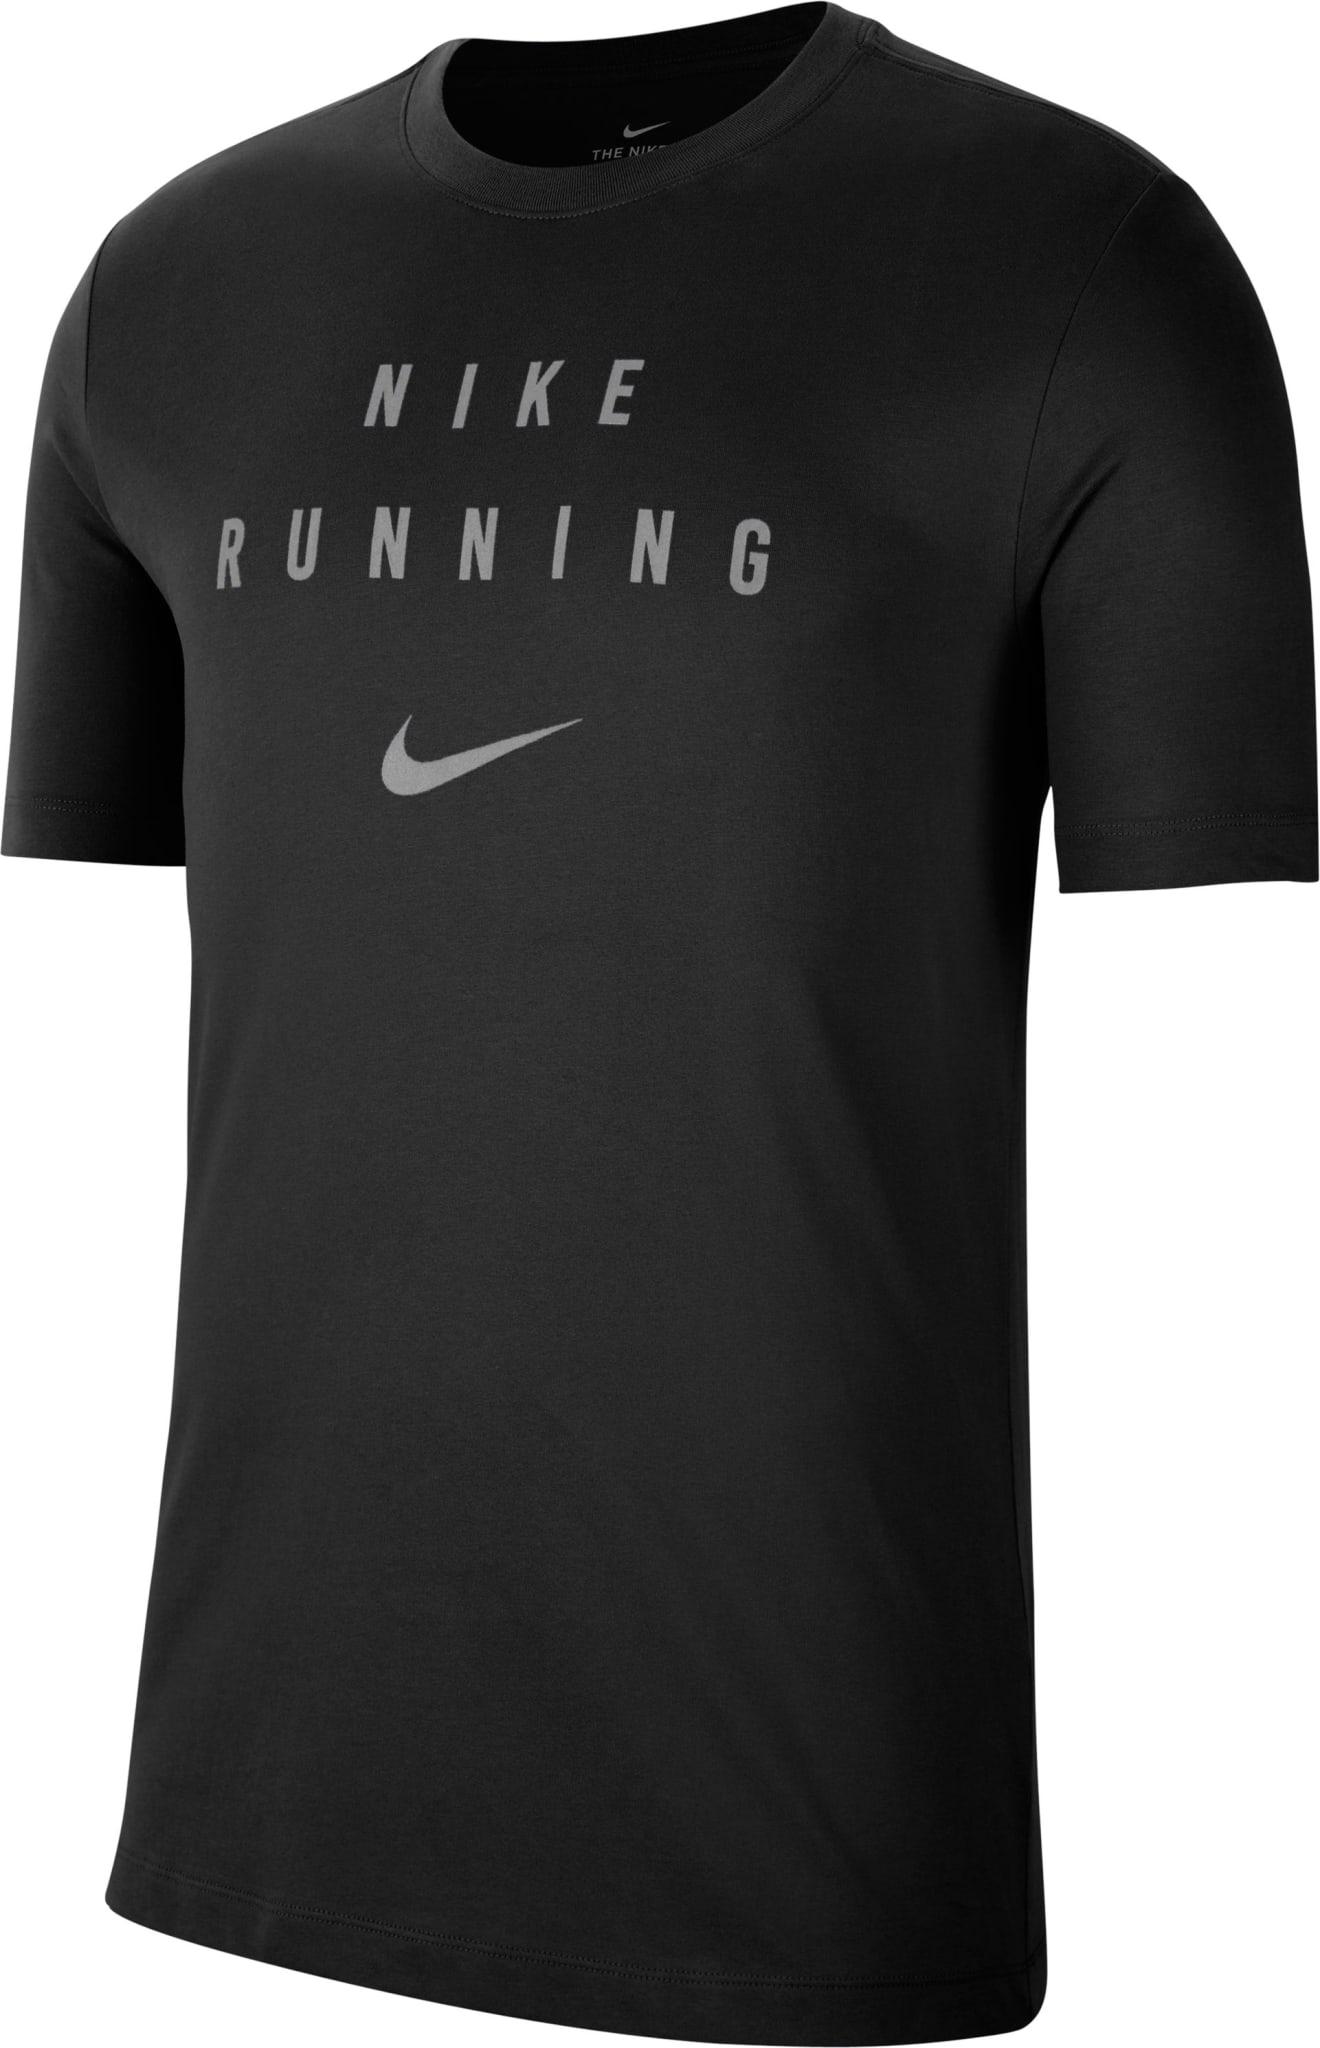 Nike Dri-FIT Run Division Men T-shirt